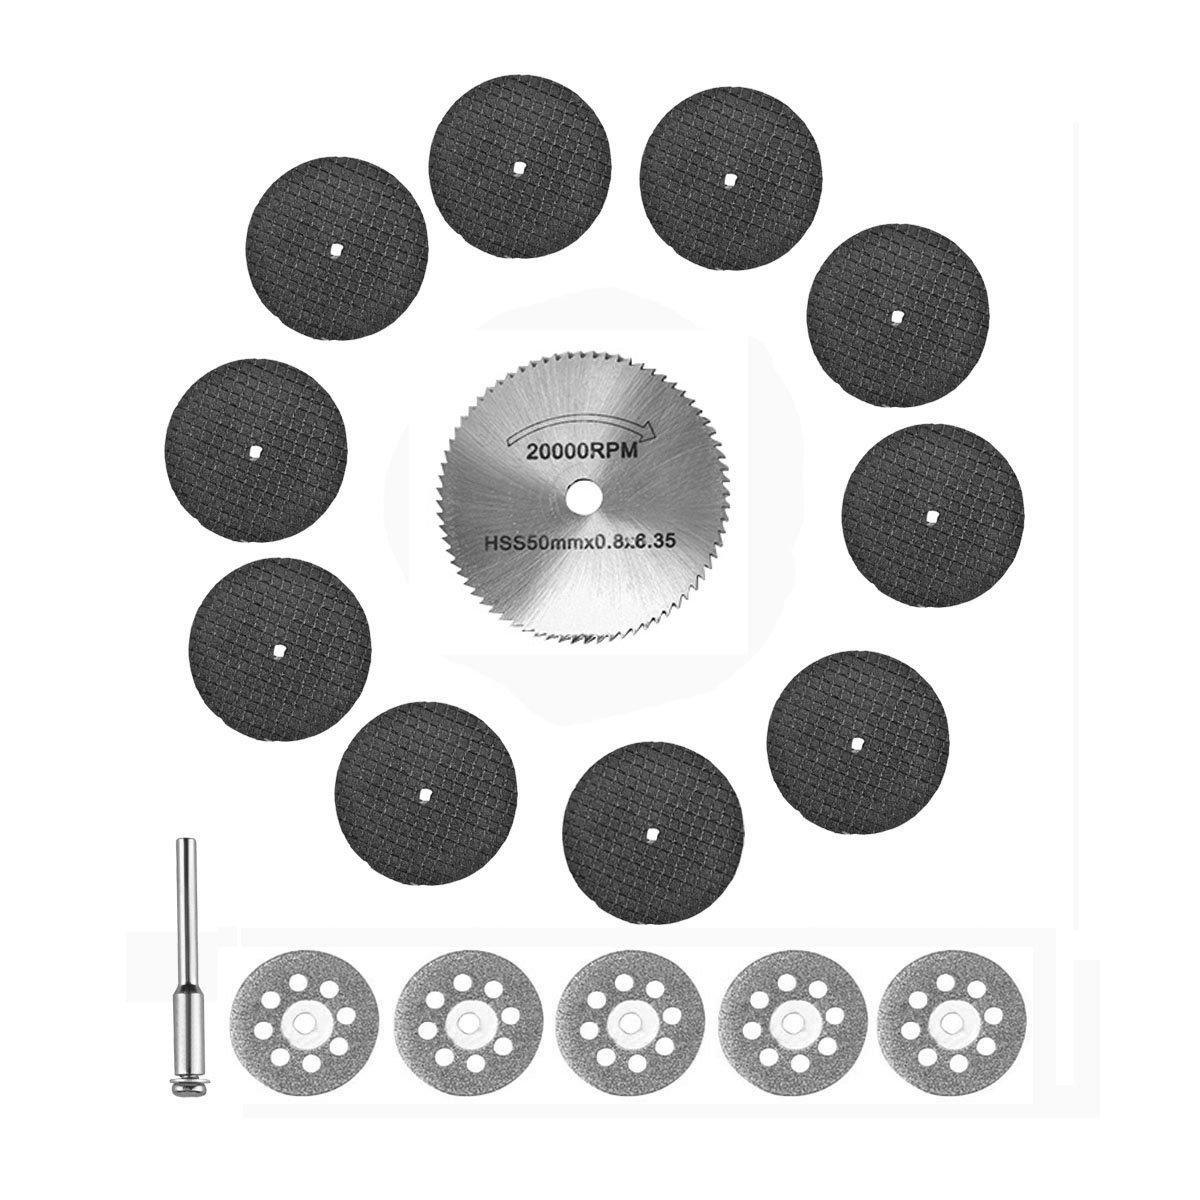 Cutting Tools/Power Rotary Tool Cutting Wheels 50mm HSS Cutting Discs Wheel 32mm Fiberglass Reinforced Abrasive Cutting Disc Cut 22mm Diamond Cutting Disc For Dremel,Proxxon Rotary Tools